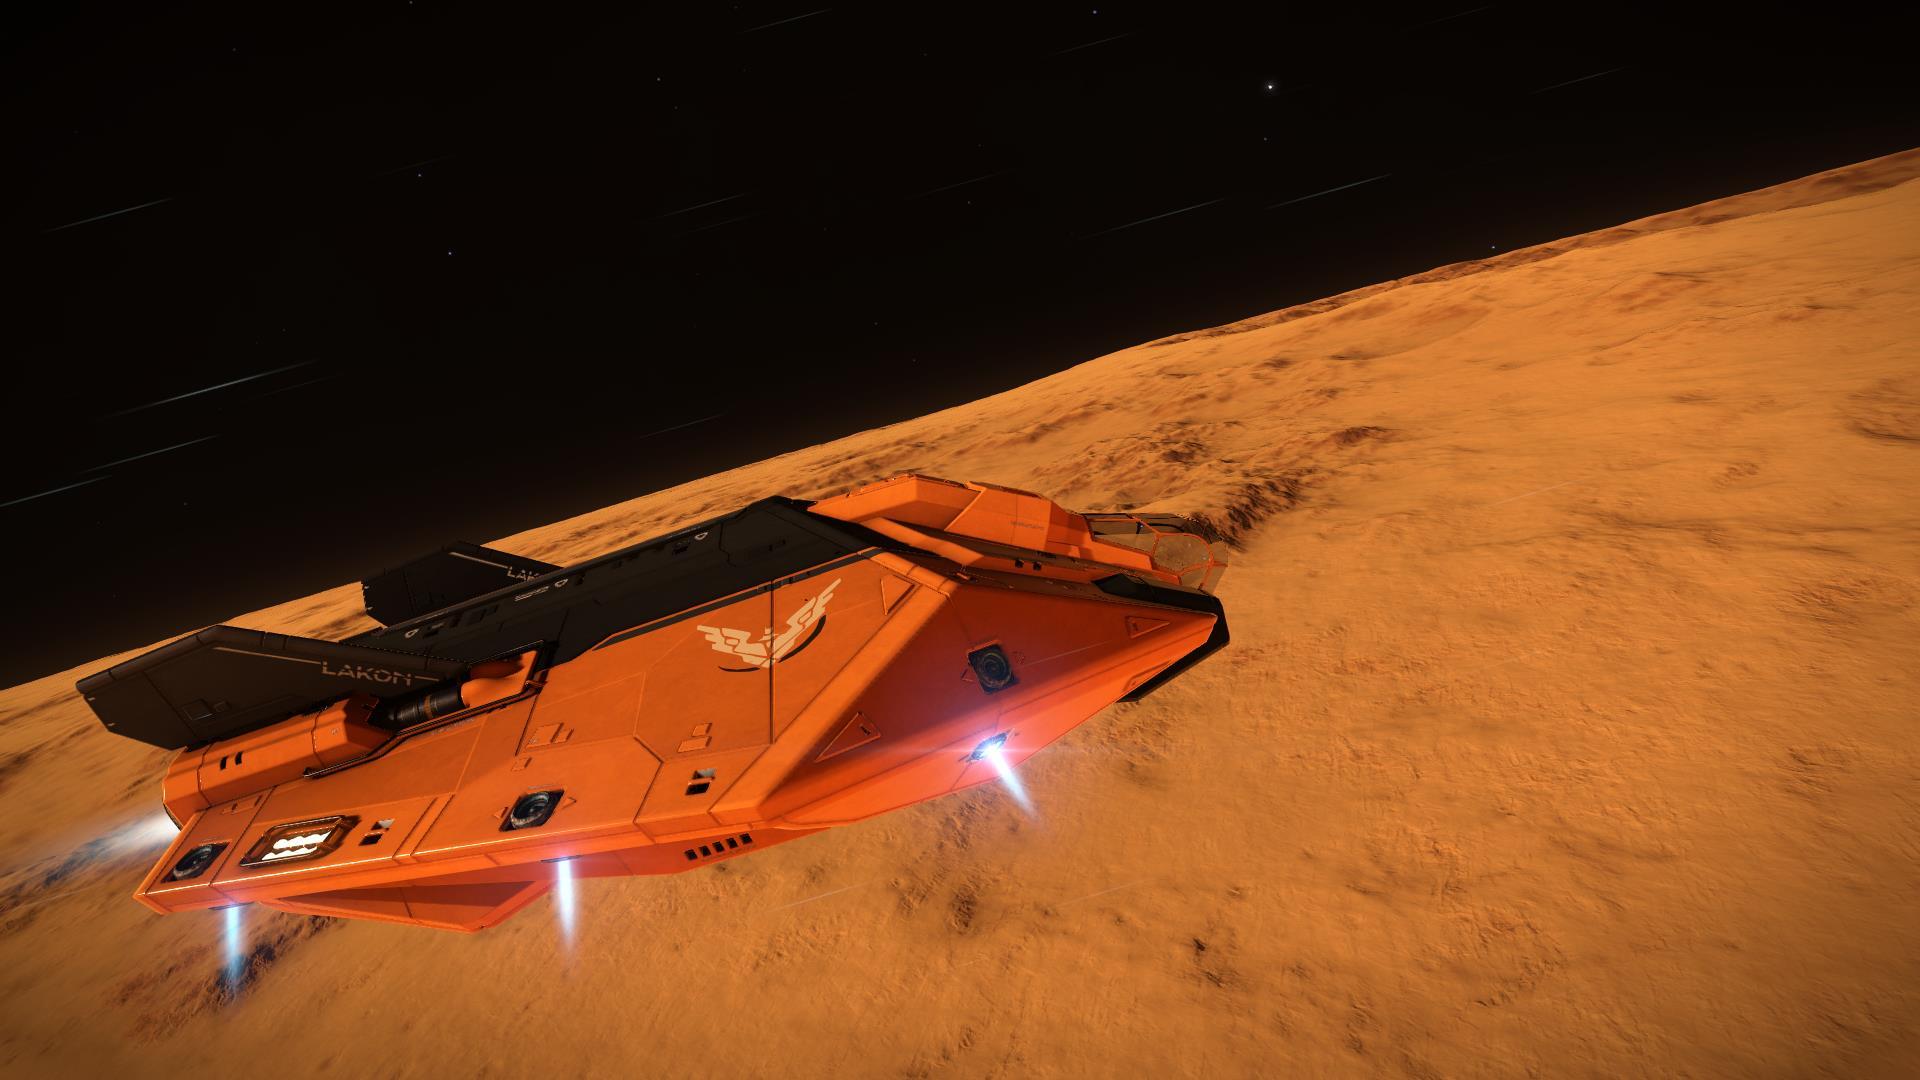 Landing on HD 143056 1